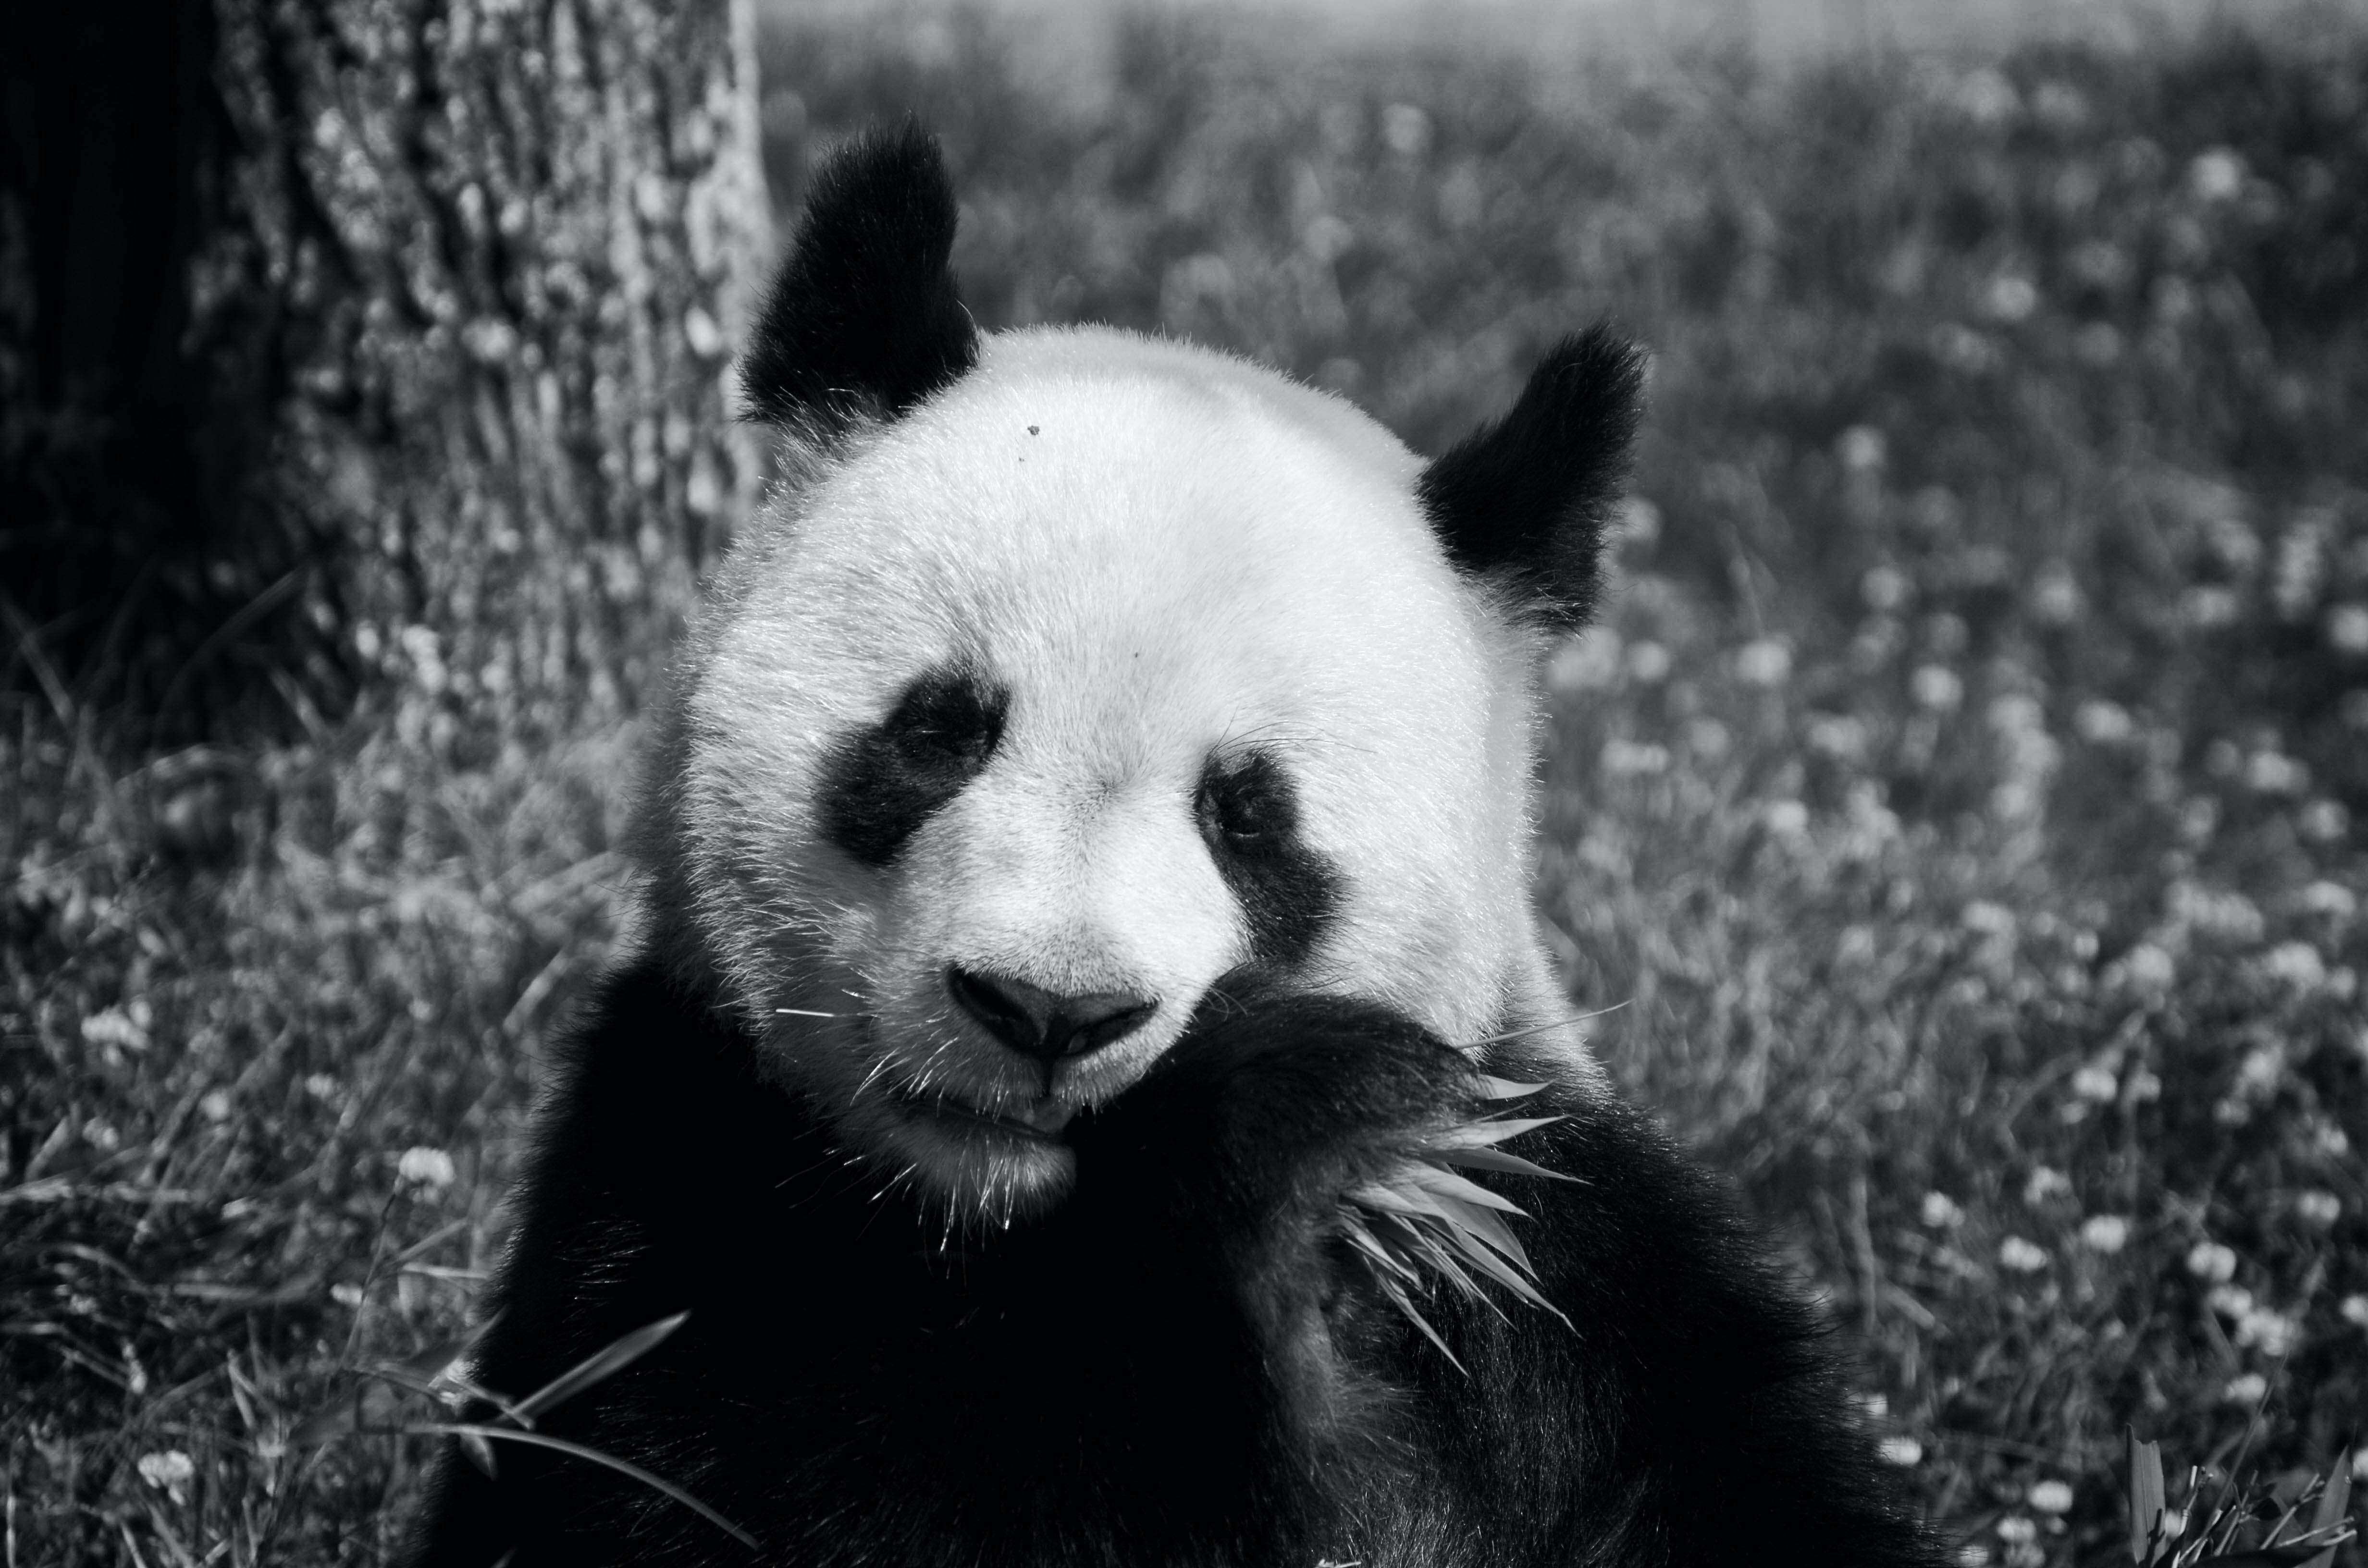 panda bear eating grass near tree